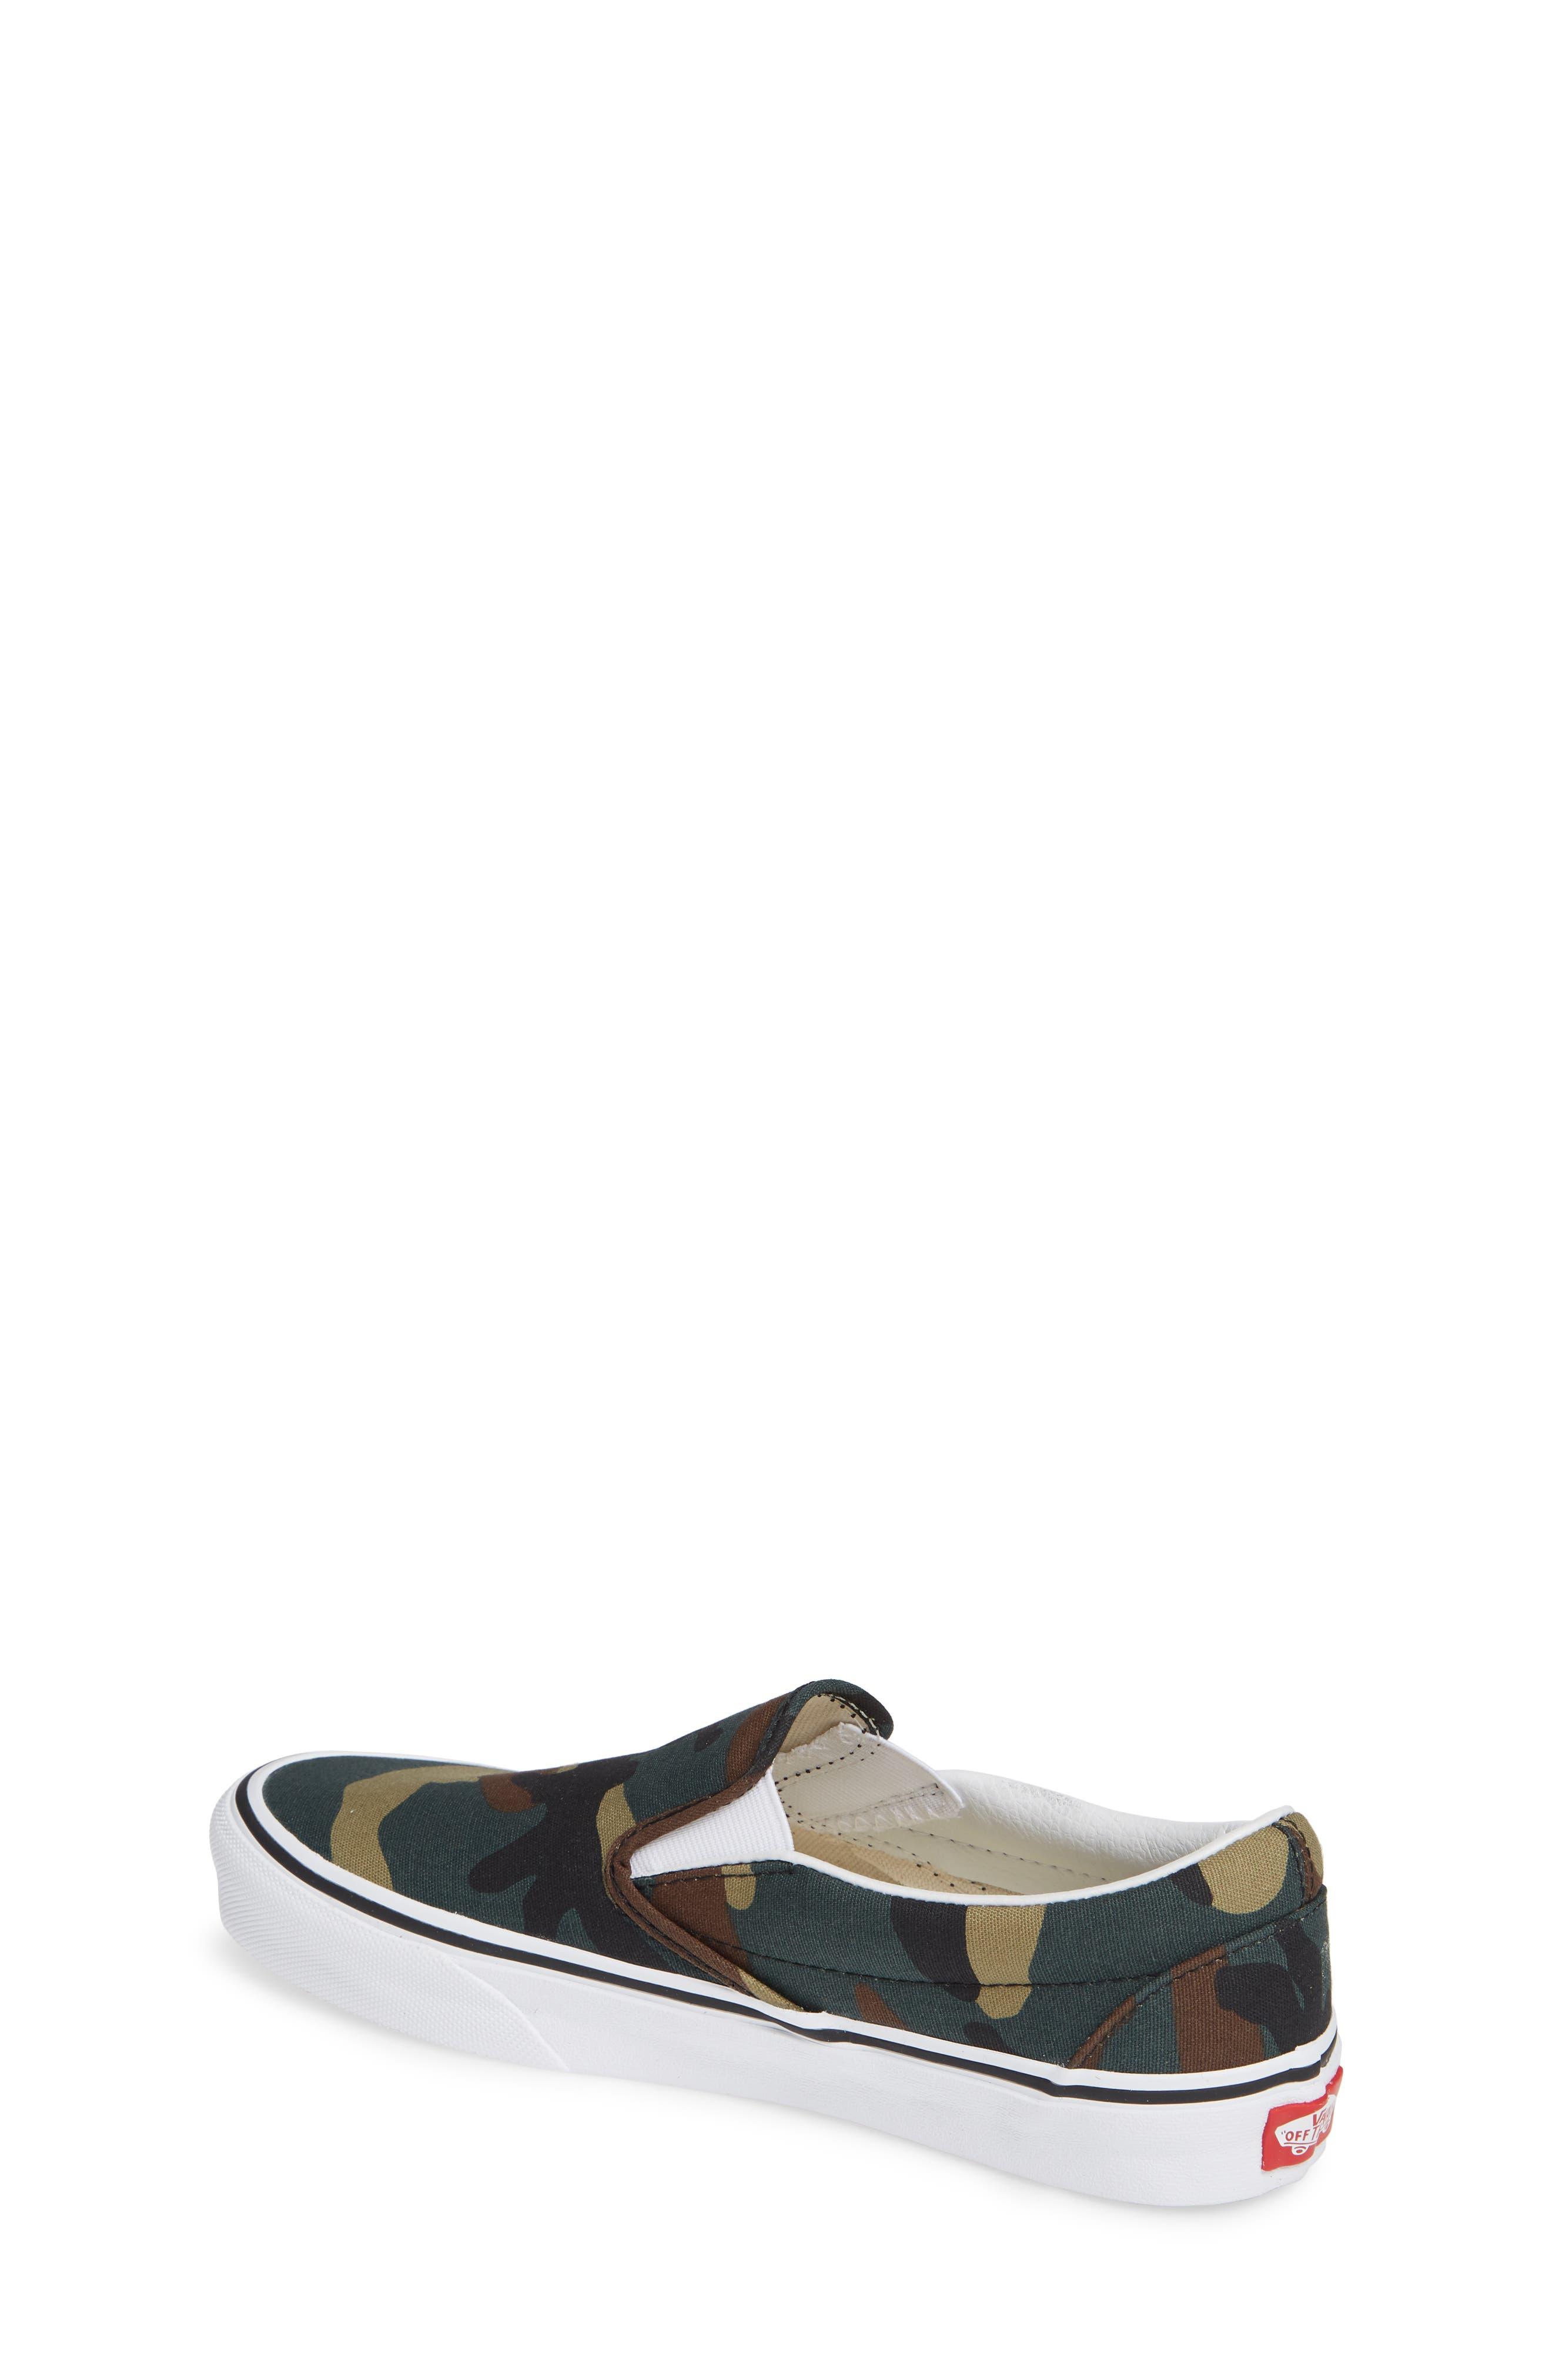 Classic Slip-On Sneaker,                             Alternate thumbnail 2, color,                             BLACK / WOODLAND